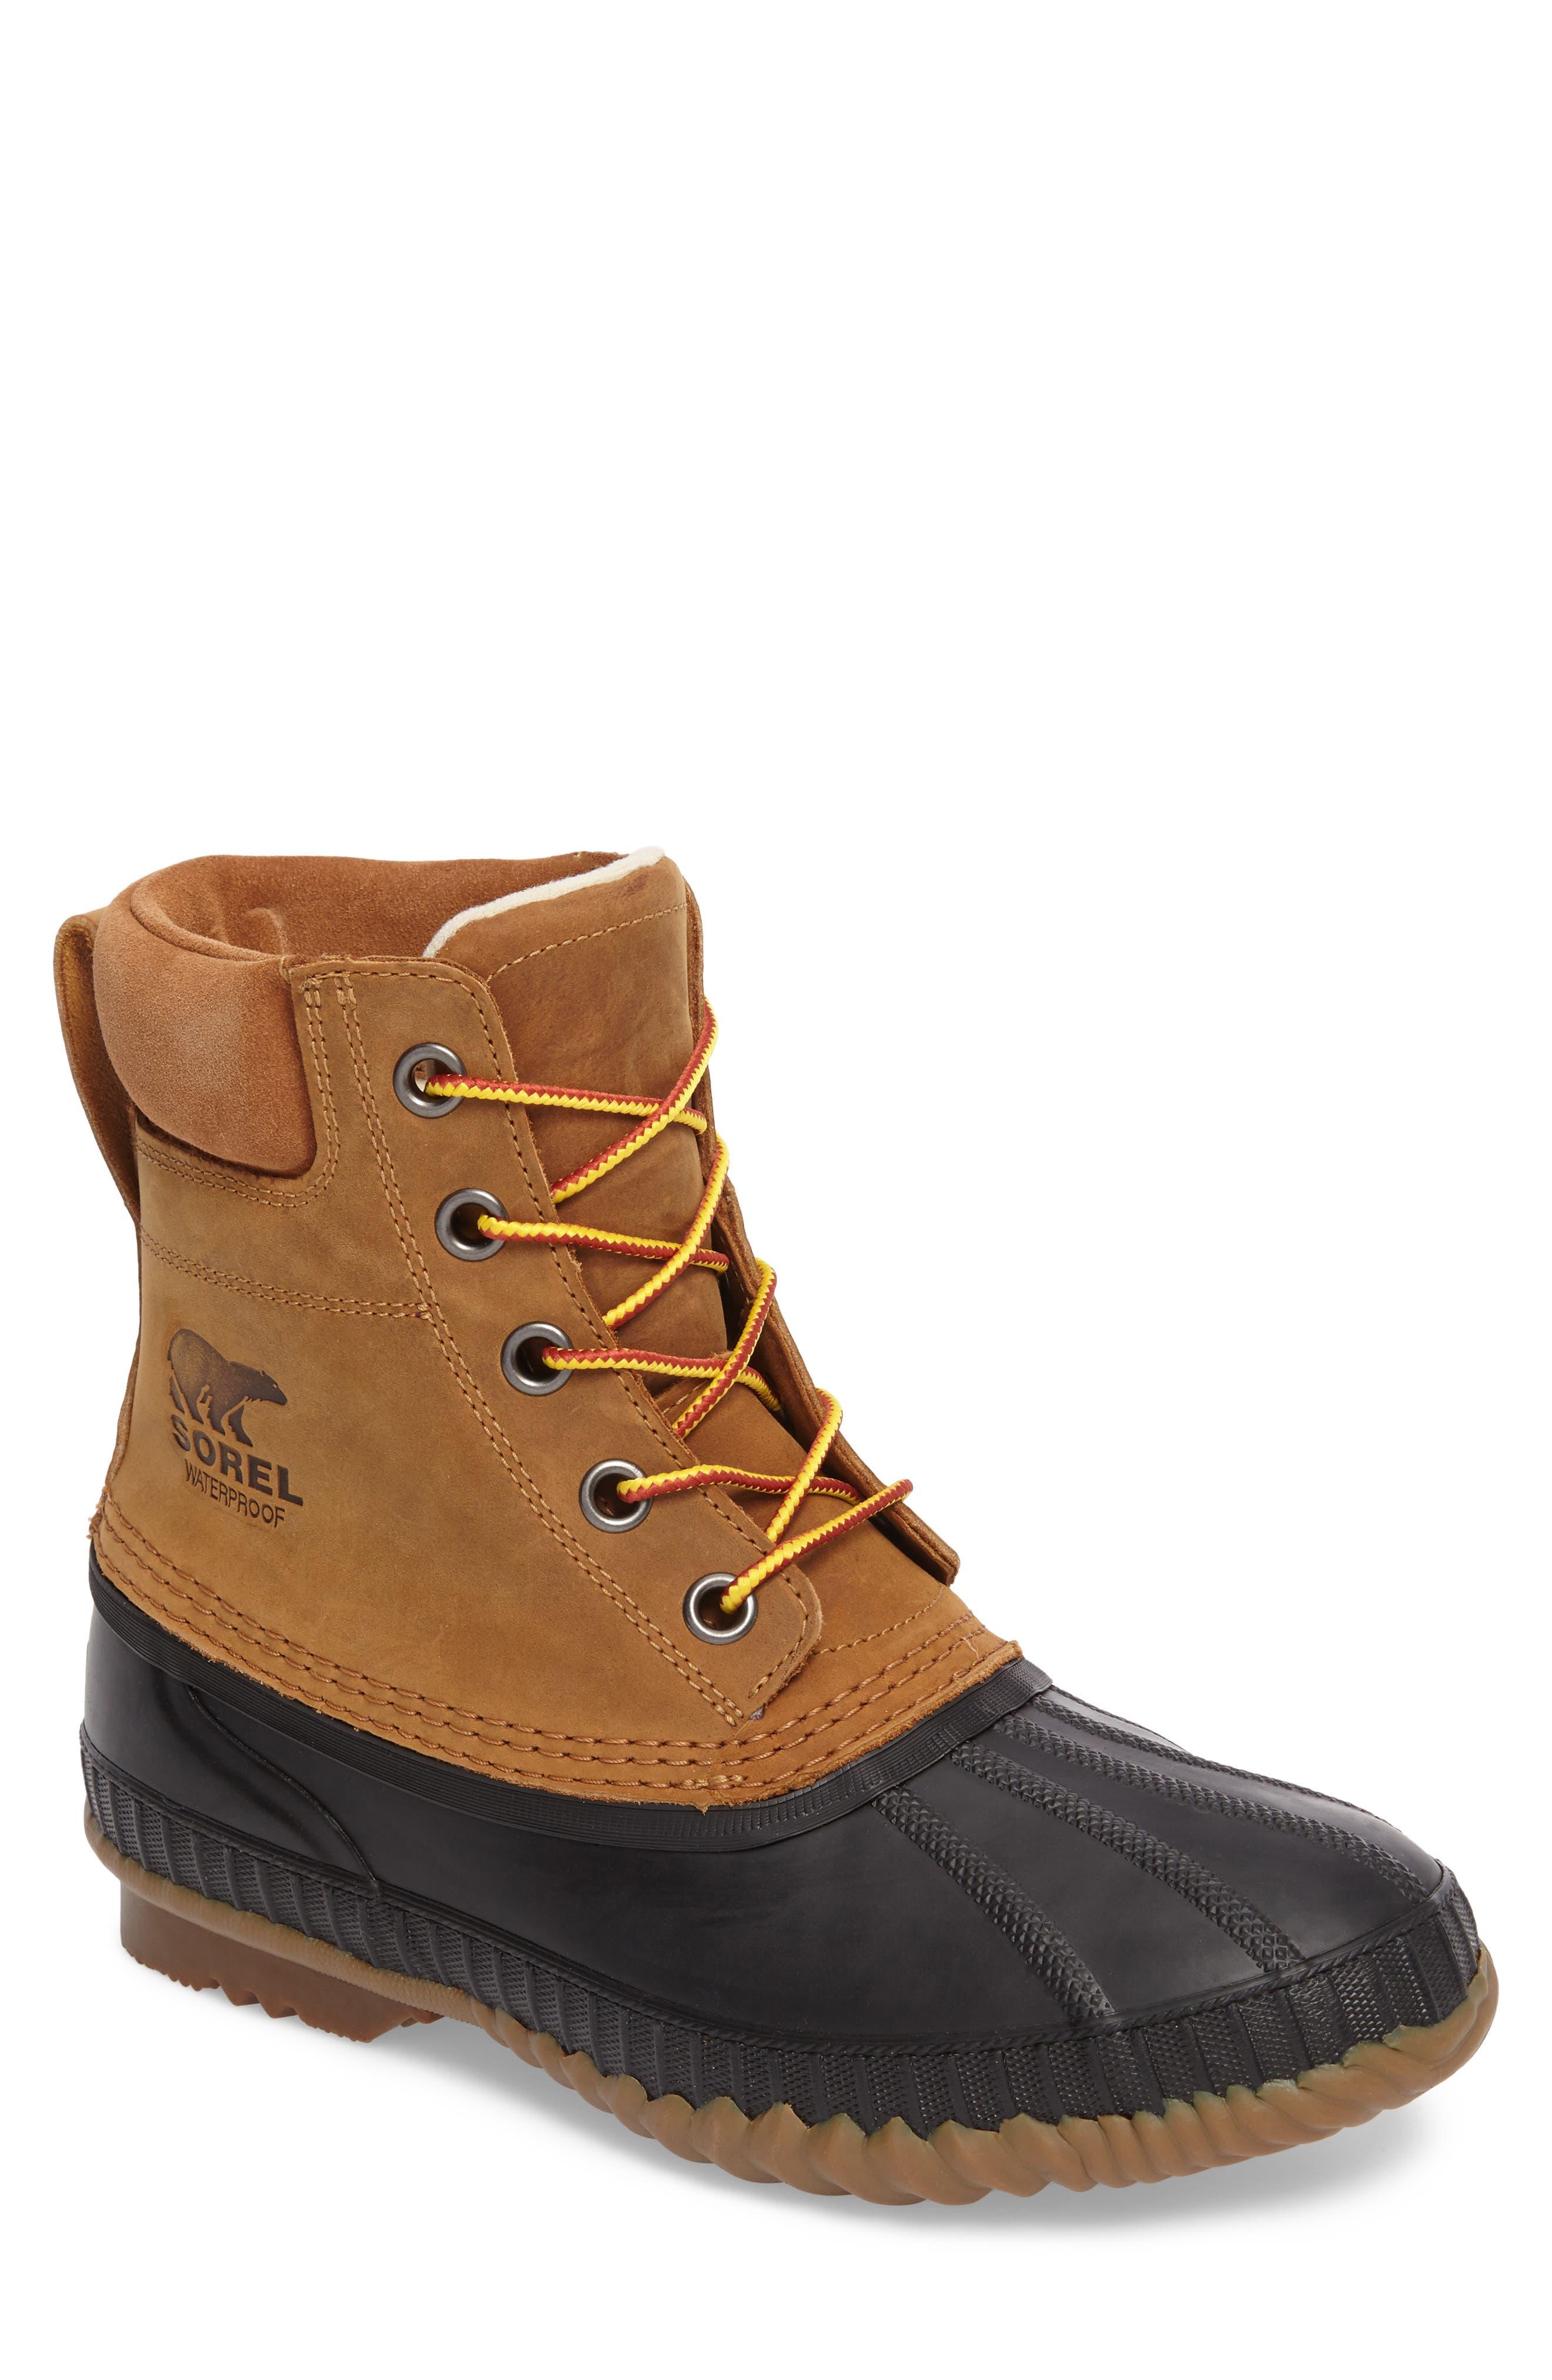 Cheyanne II Waterpoof Boot,                             Main thumbnail 1, color,                             Chipmunk